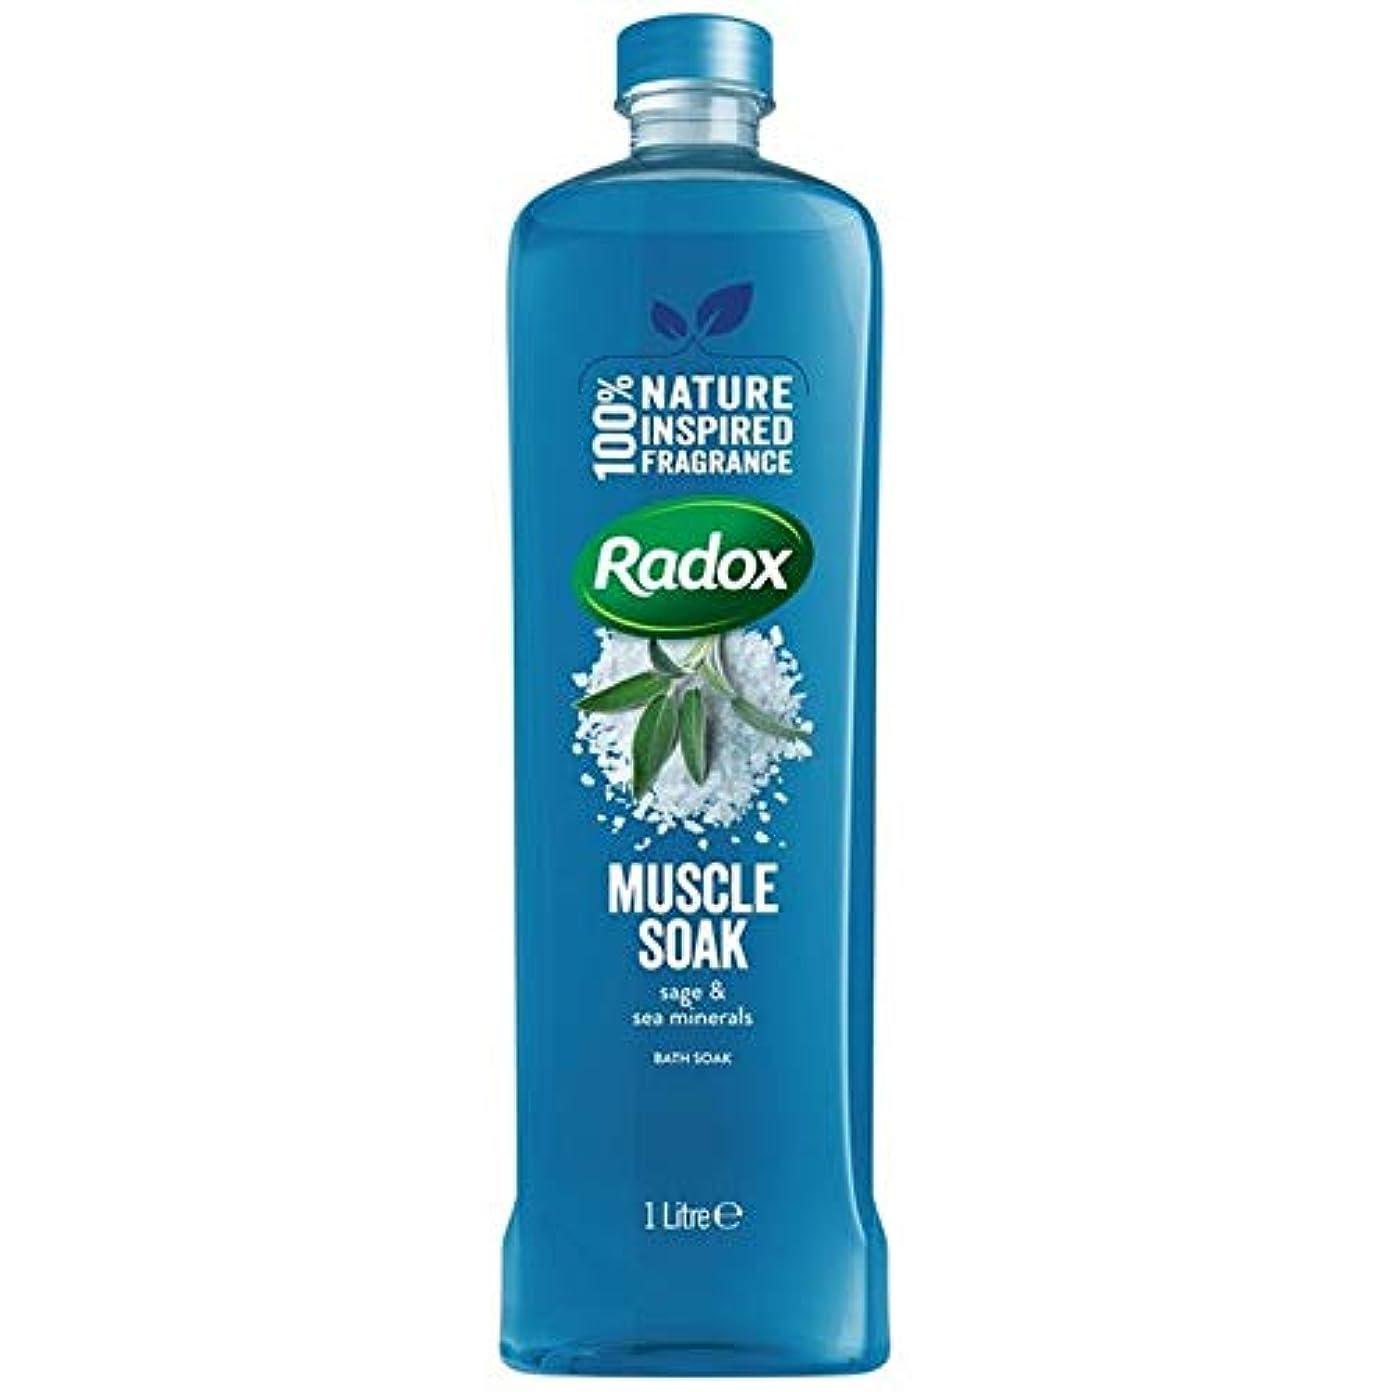 [Radox] Radox筋はセージ&海のミネラルの1リットルに浸し風呂につかります - Radox Muscle Soak Bath Soak with Sage & Sea Minerals 1L [並行輸入品]